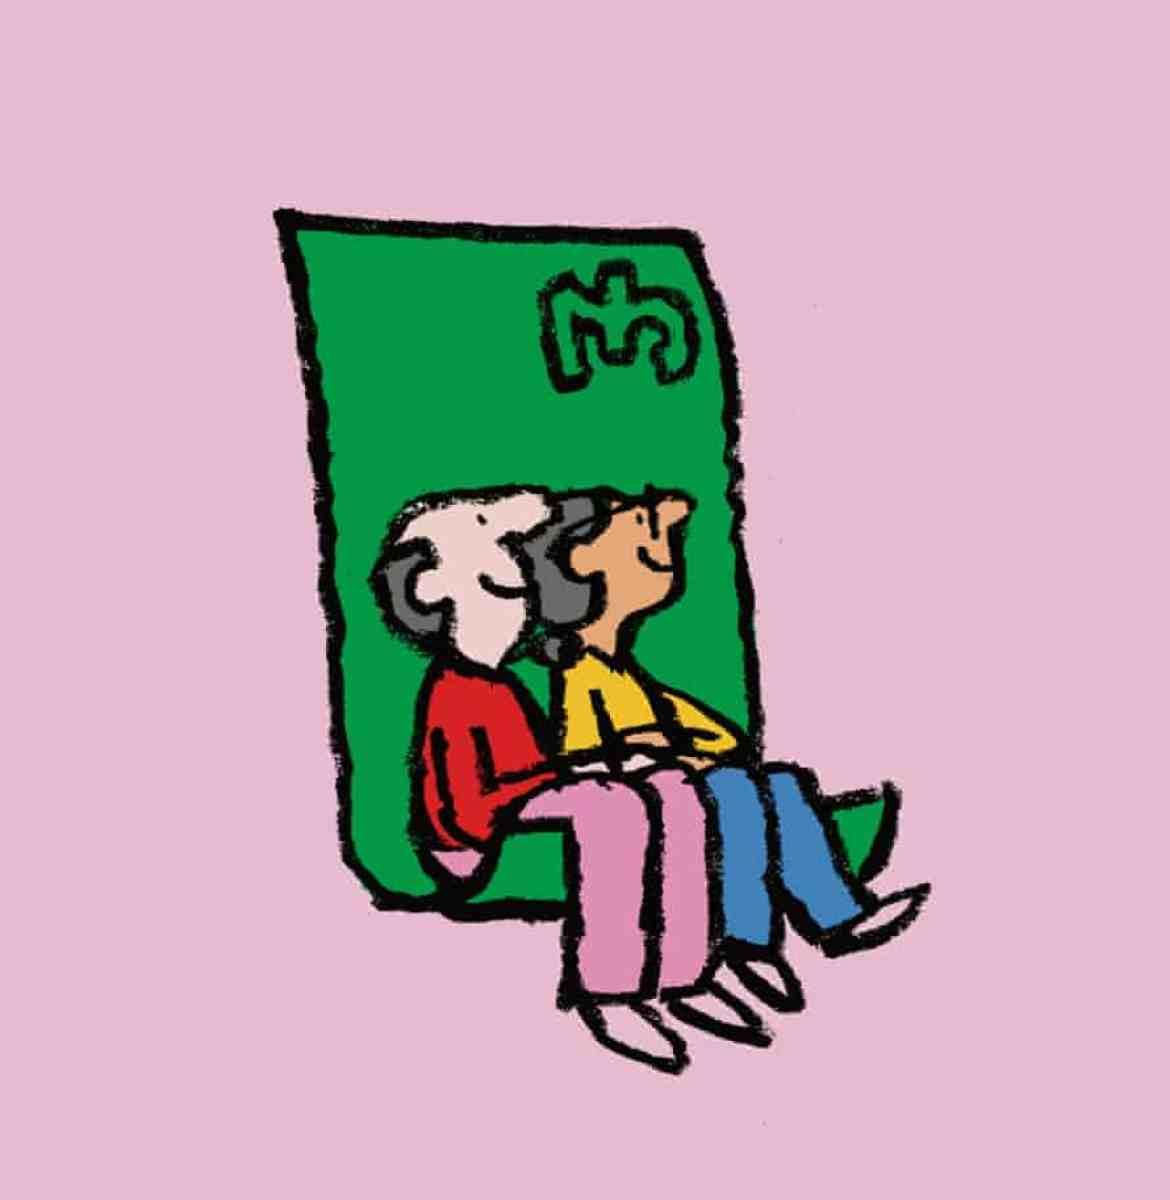 Illustration for Guardian Money ISAs 27.02.21